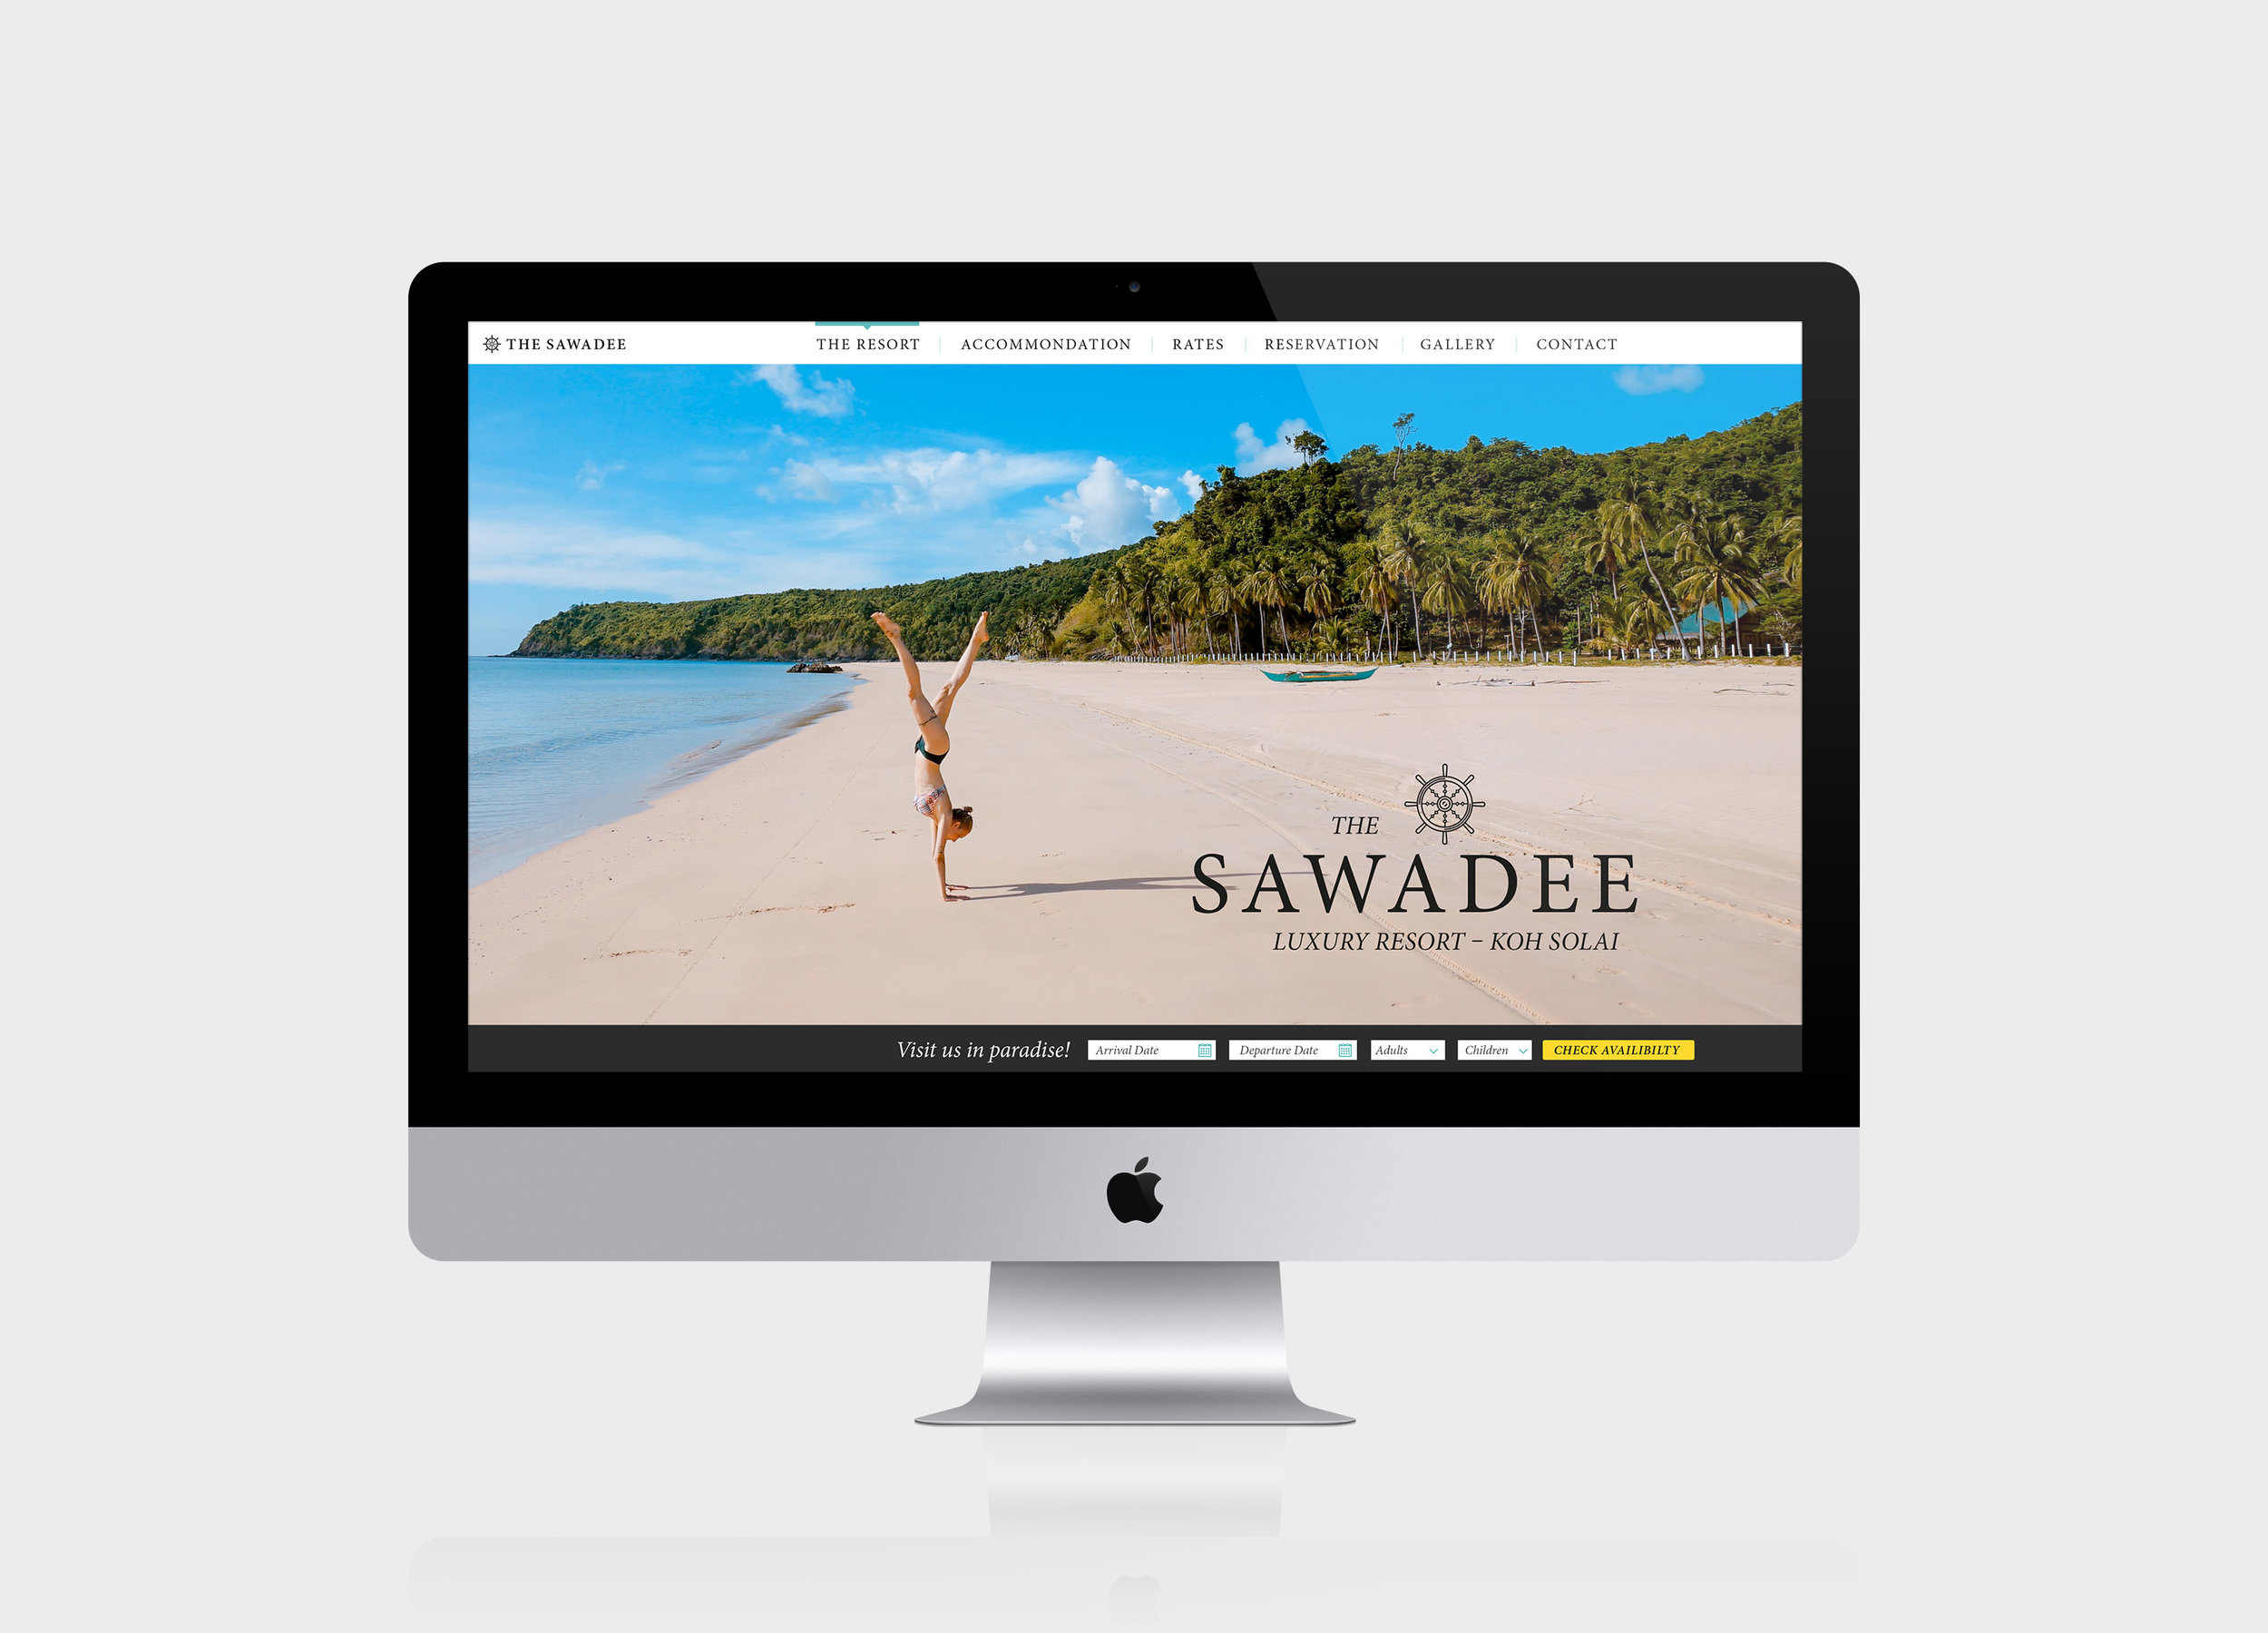 iMac-2012-big_Sawadee_schmaler2.jpg